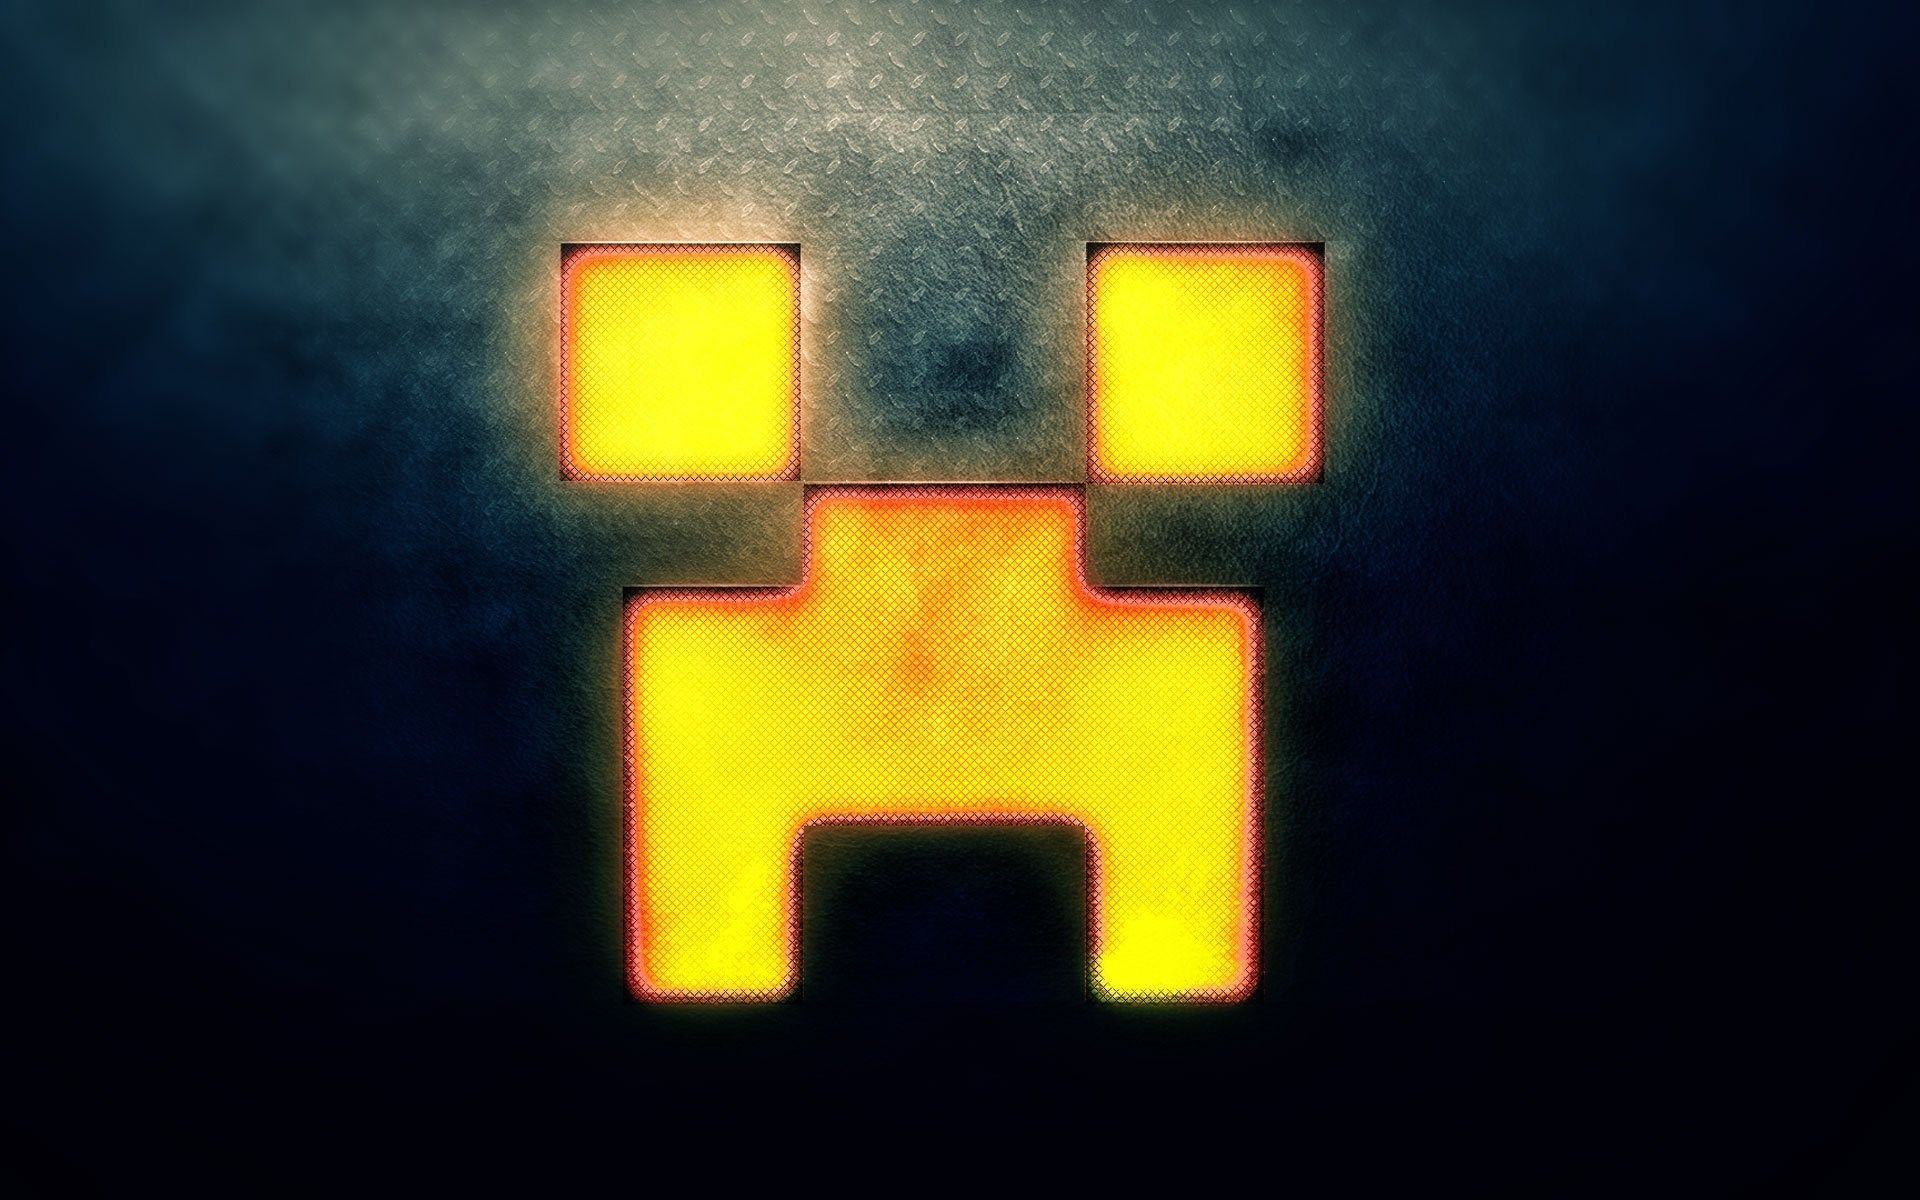 Download Free Minecraft Creeper Iphone Wallpaper